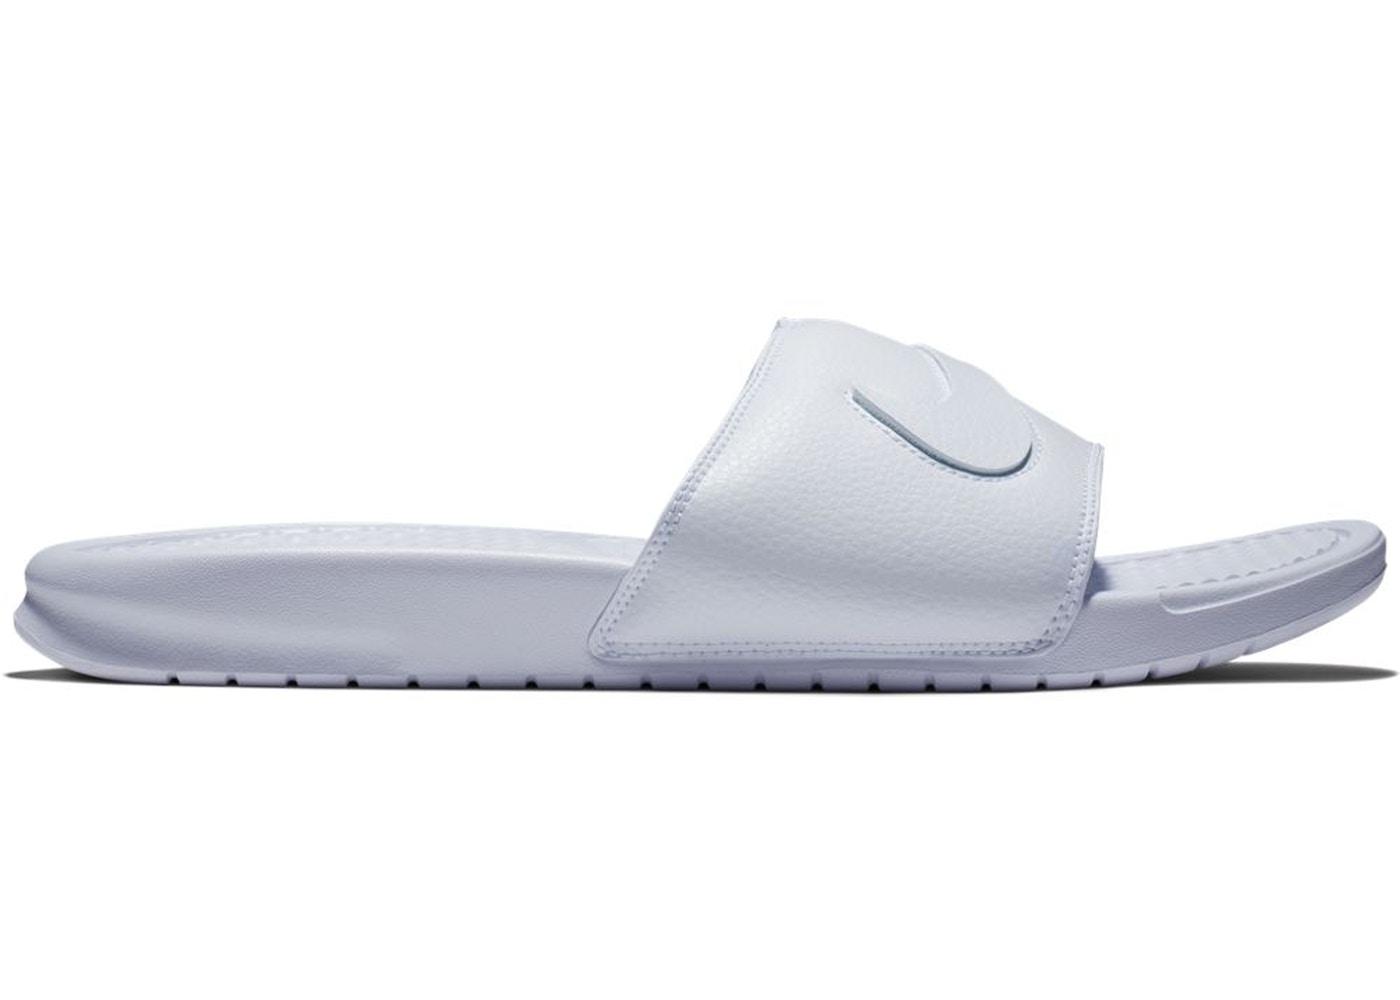 21deb2dda55 Nike Benassi JDI Swoosh Pack White - AQ8614-100